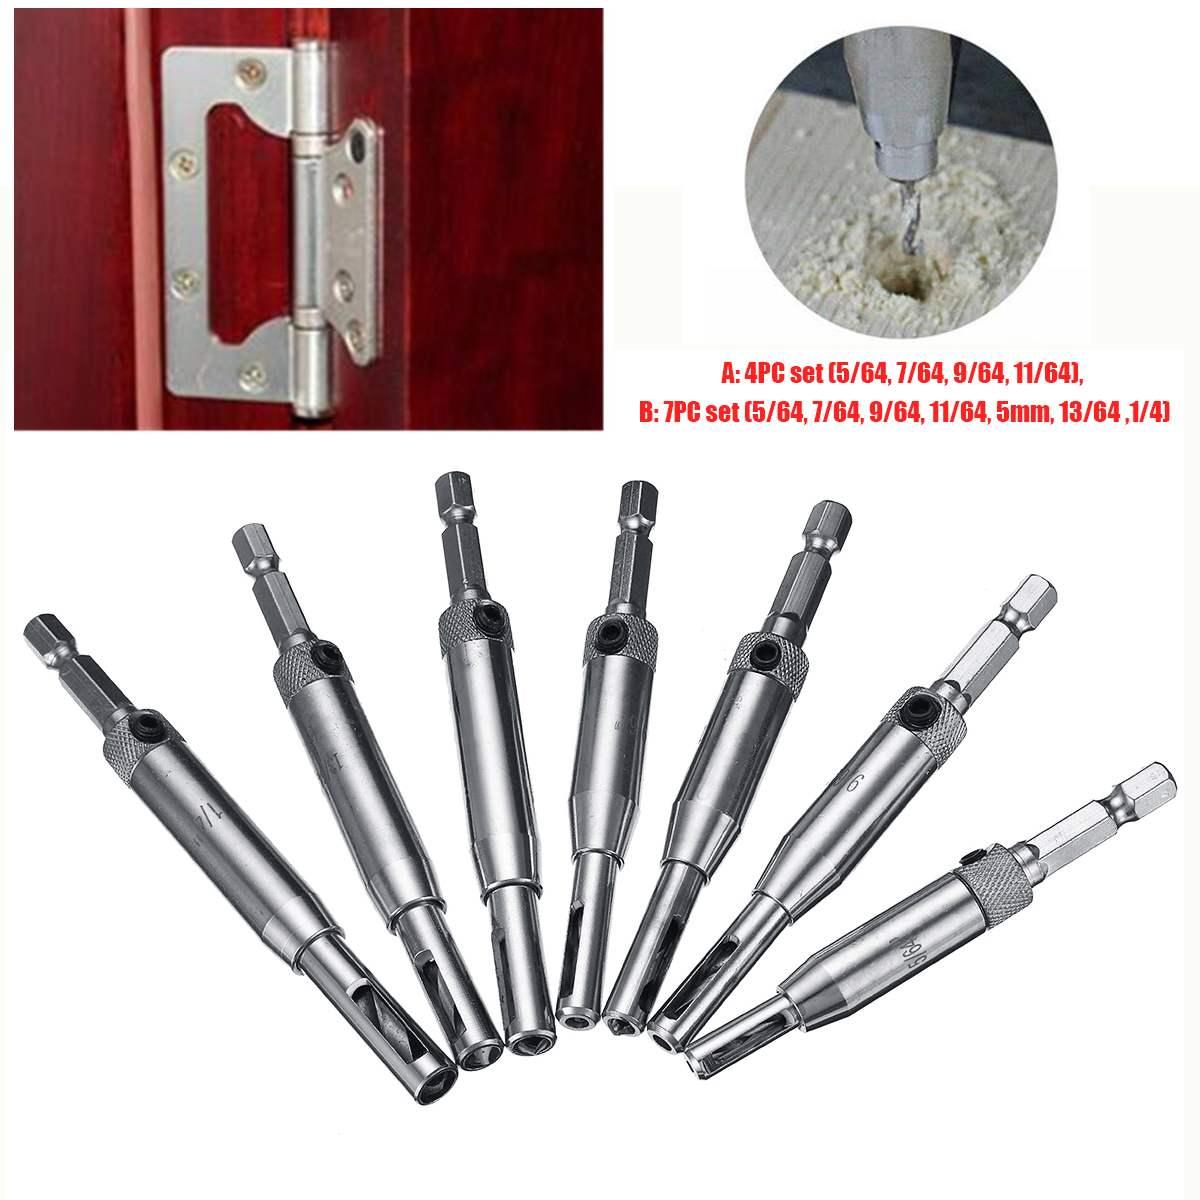 7pc//set HSS Center Drill Bits Door Self-centering Hinge Hole Opening Drill Bit